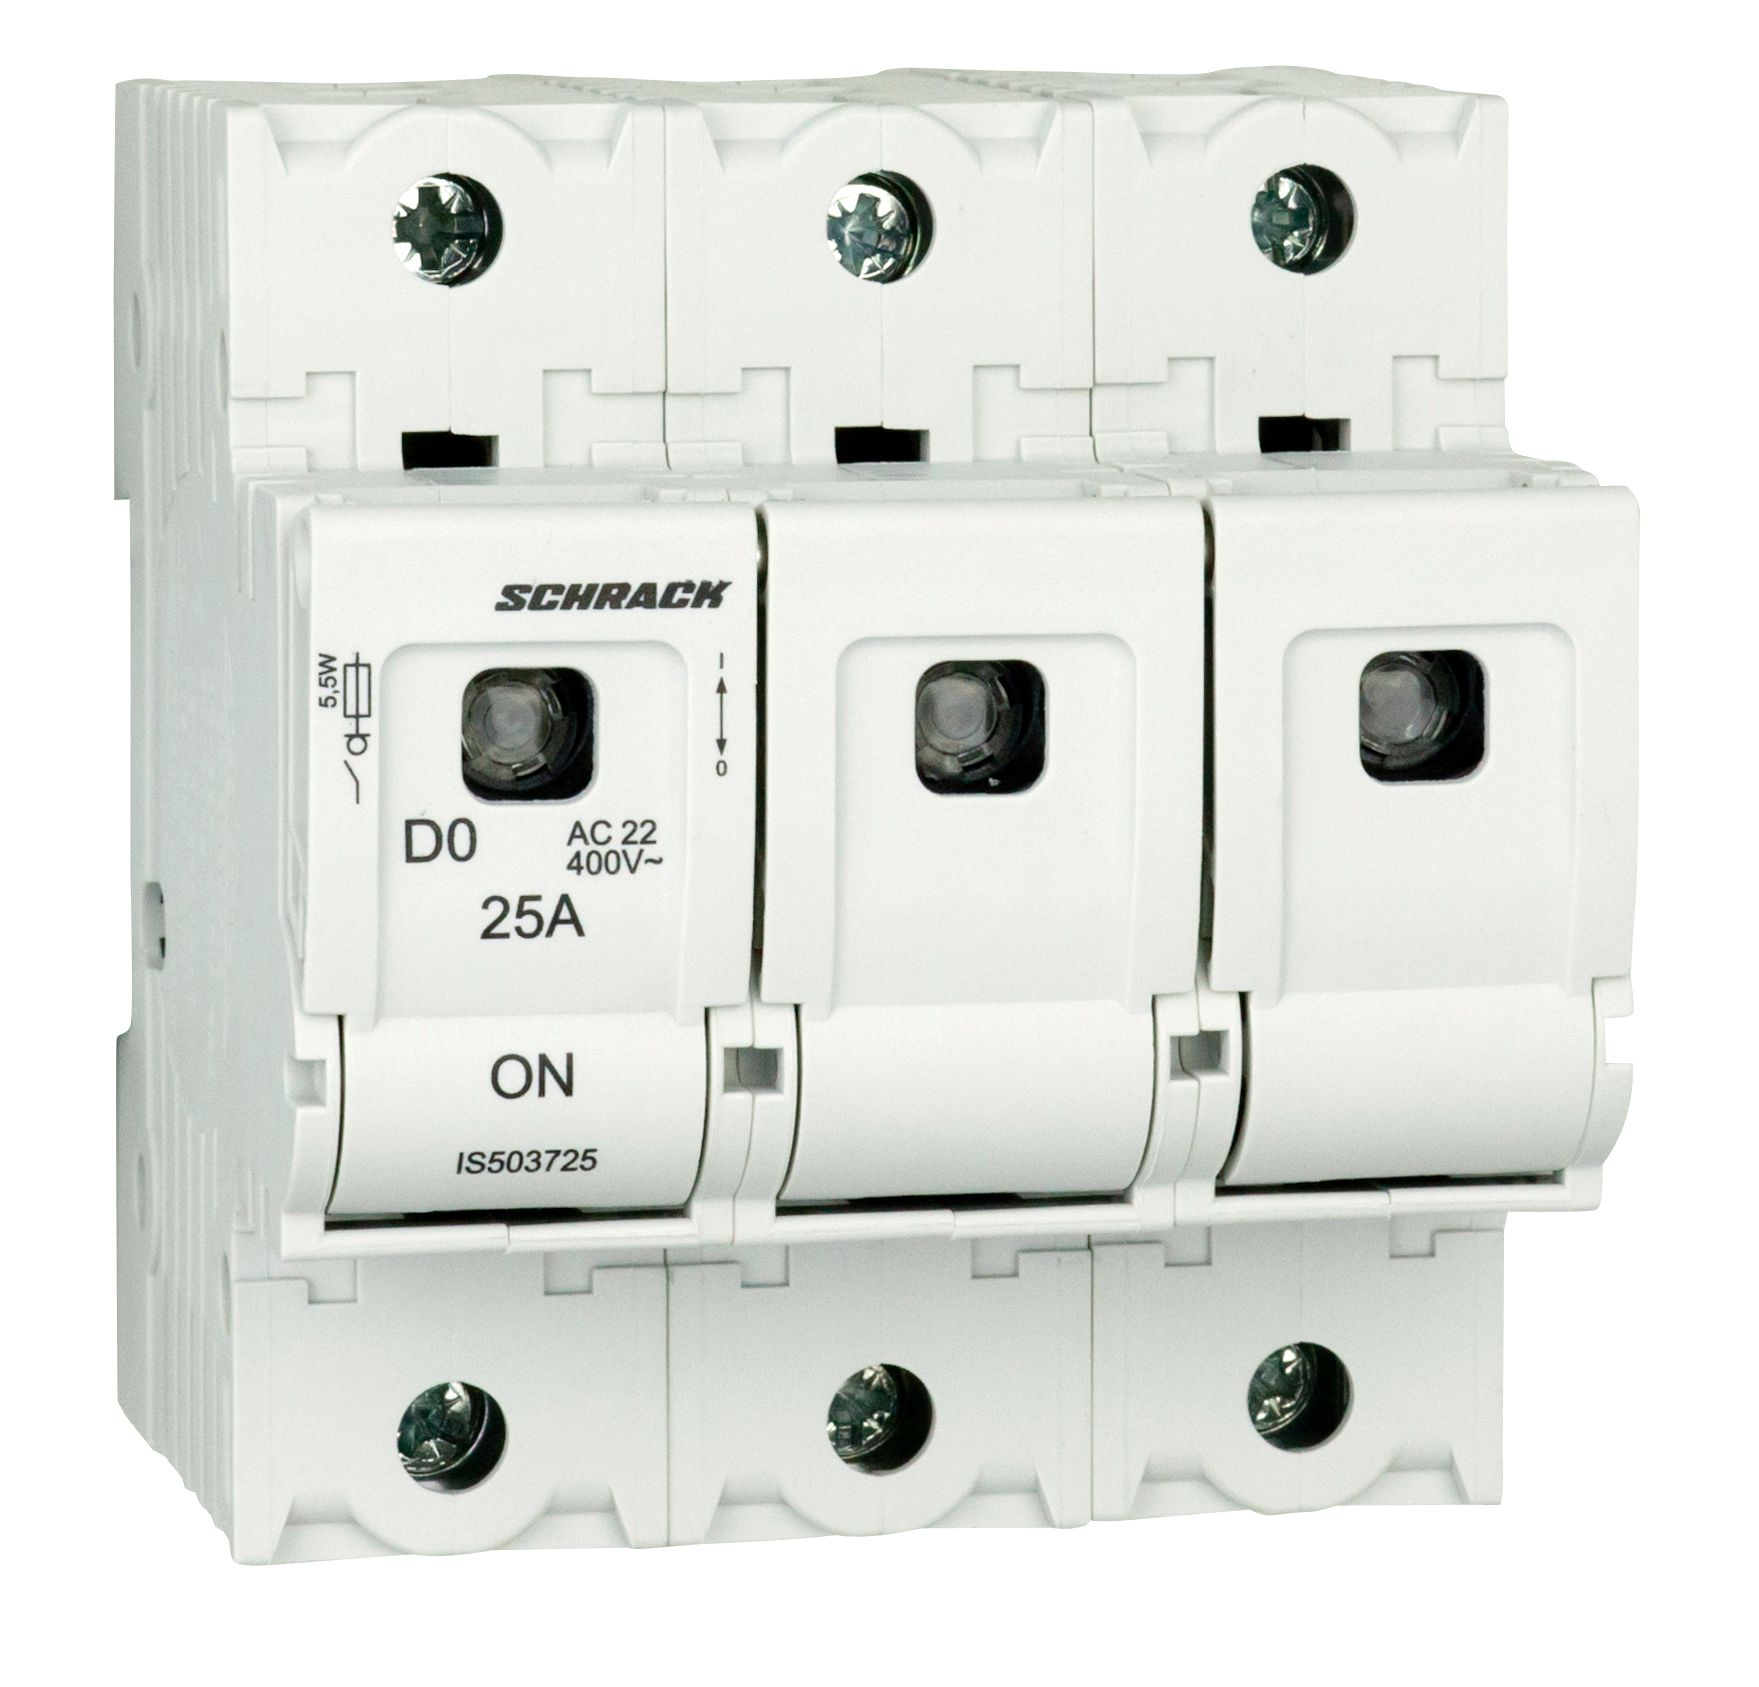 1 Stk D02-Lasttrennschalter ARROW S, 3-polig, 25A IS503725--